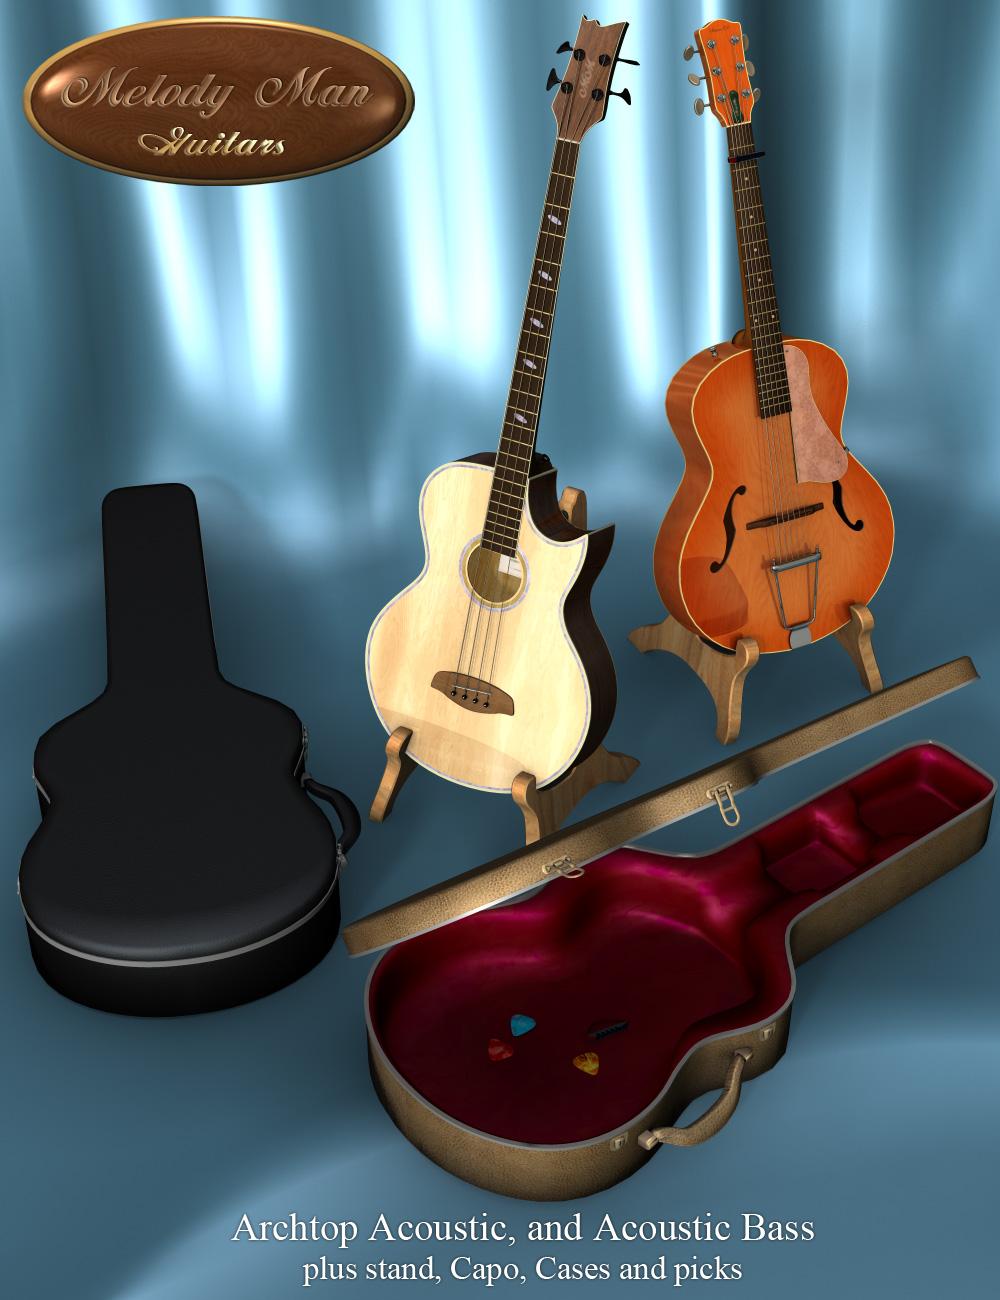 Melody Man Acoustic Guitars by: Don AlbertSimon3D, 3D Models by Daz 3D